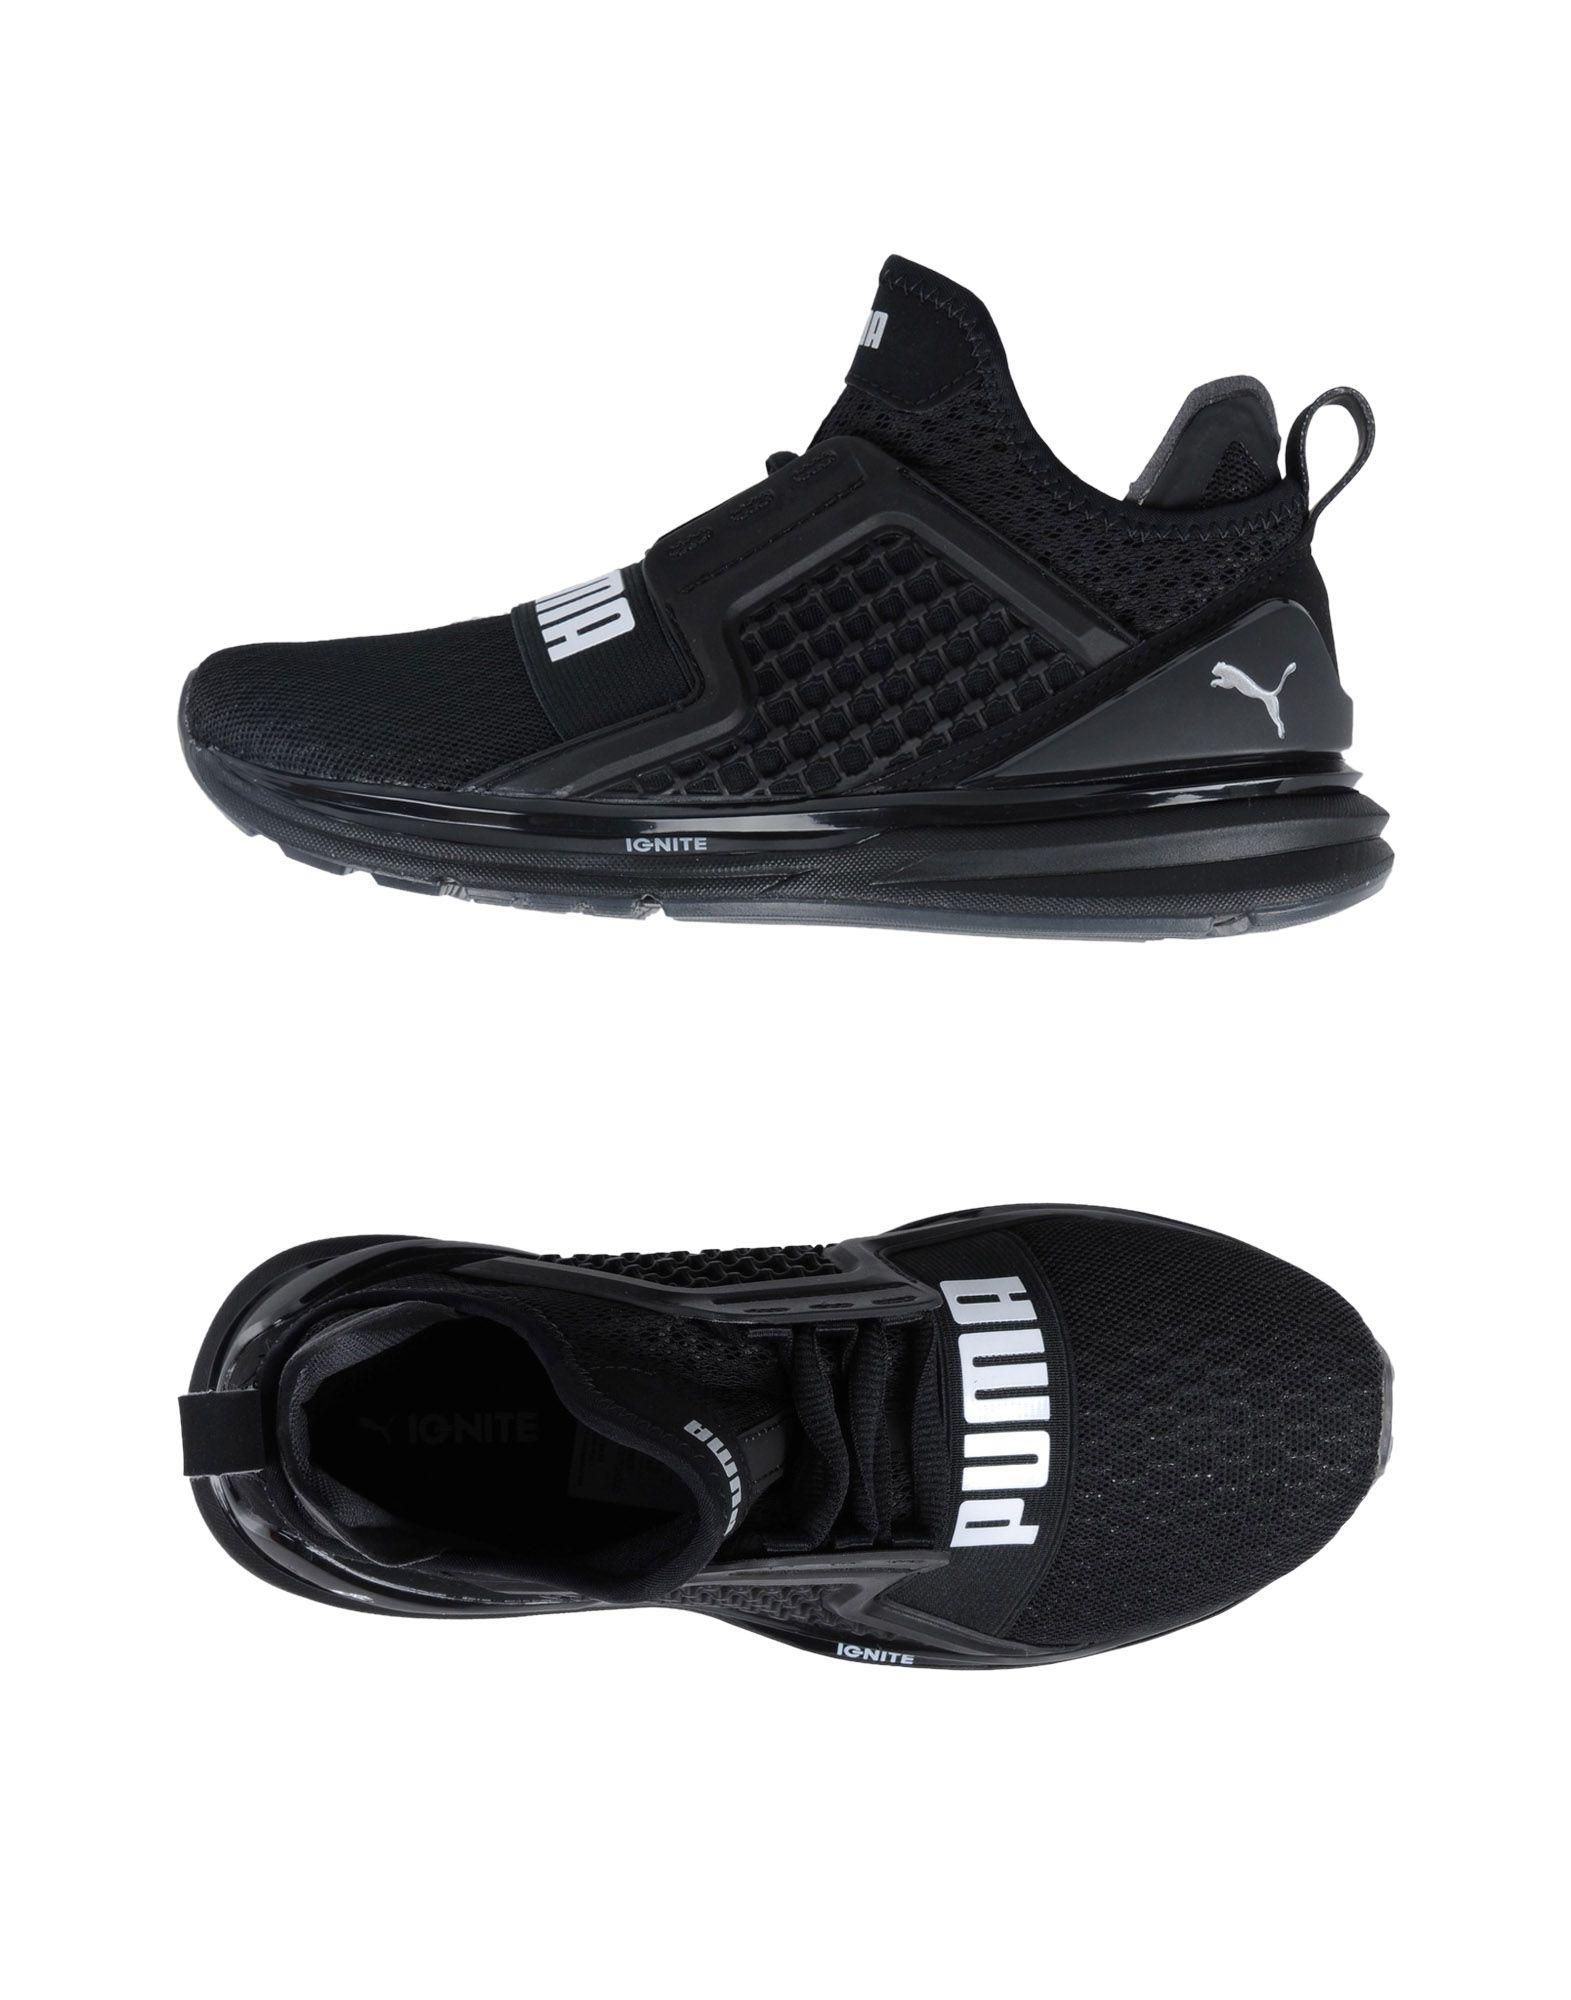 Puma Ignite Limitless Jr - Sneakers - Women Puma Sneakers online on ... ed56c5fef